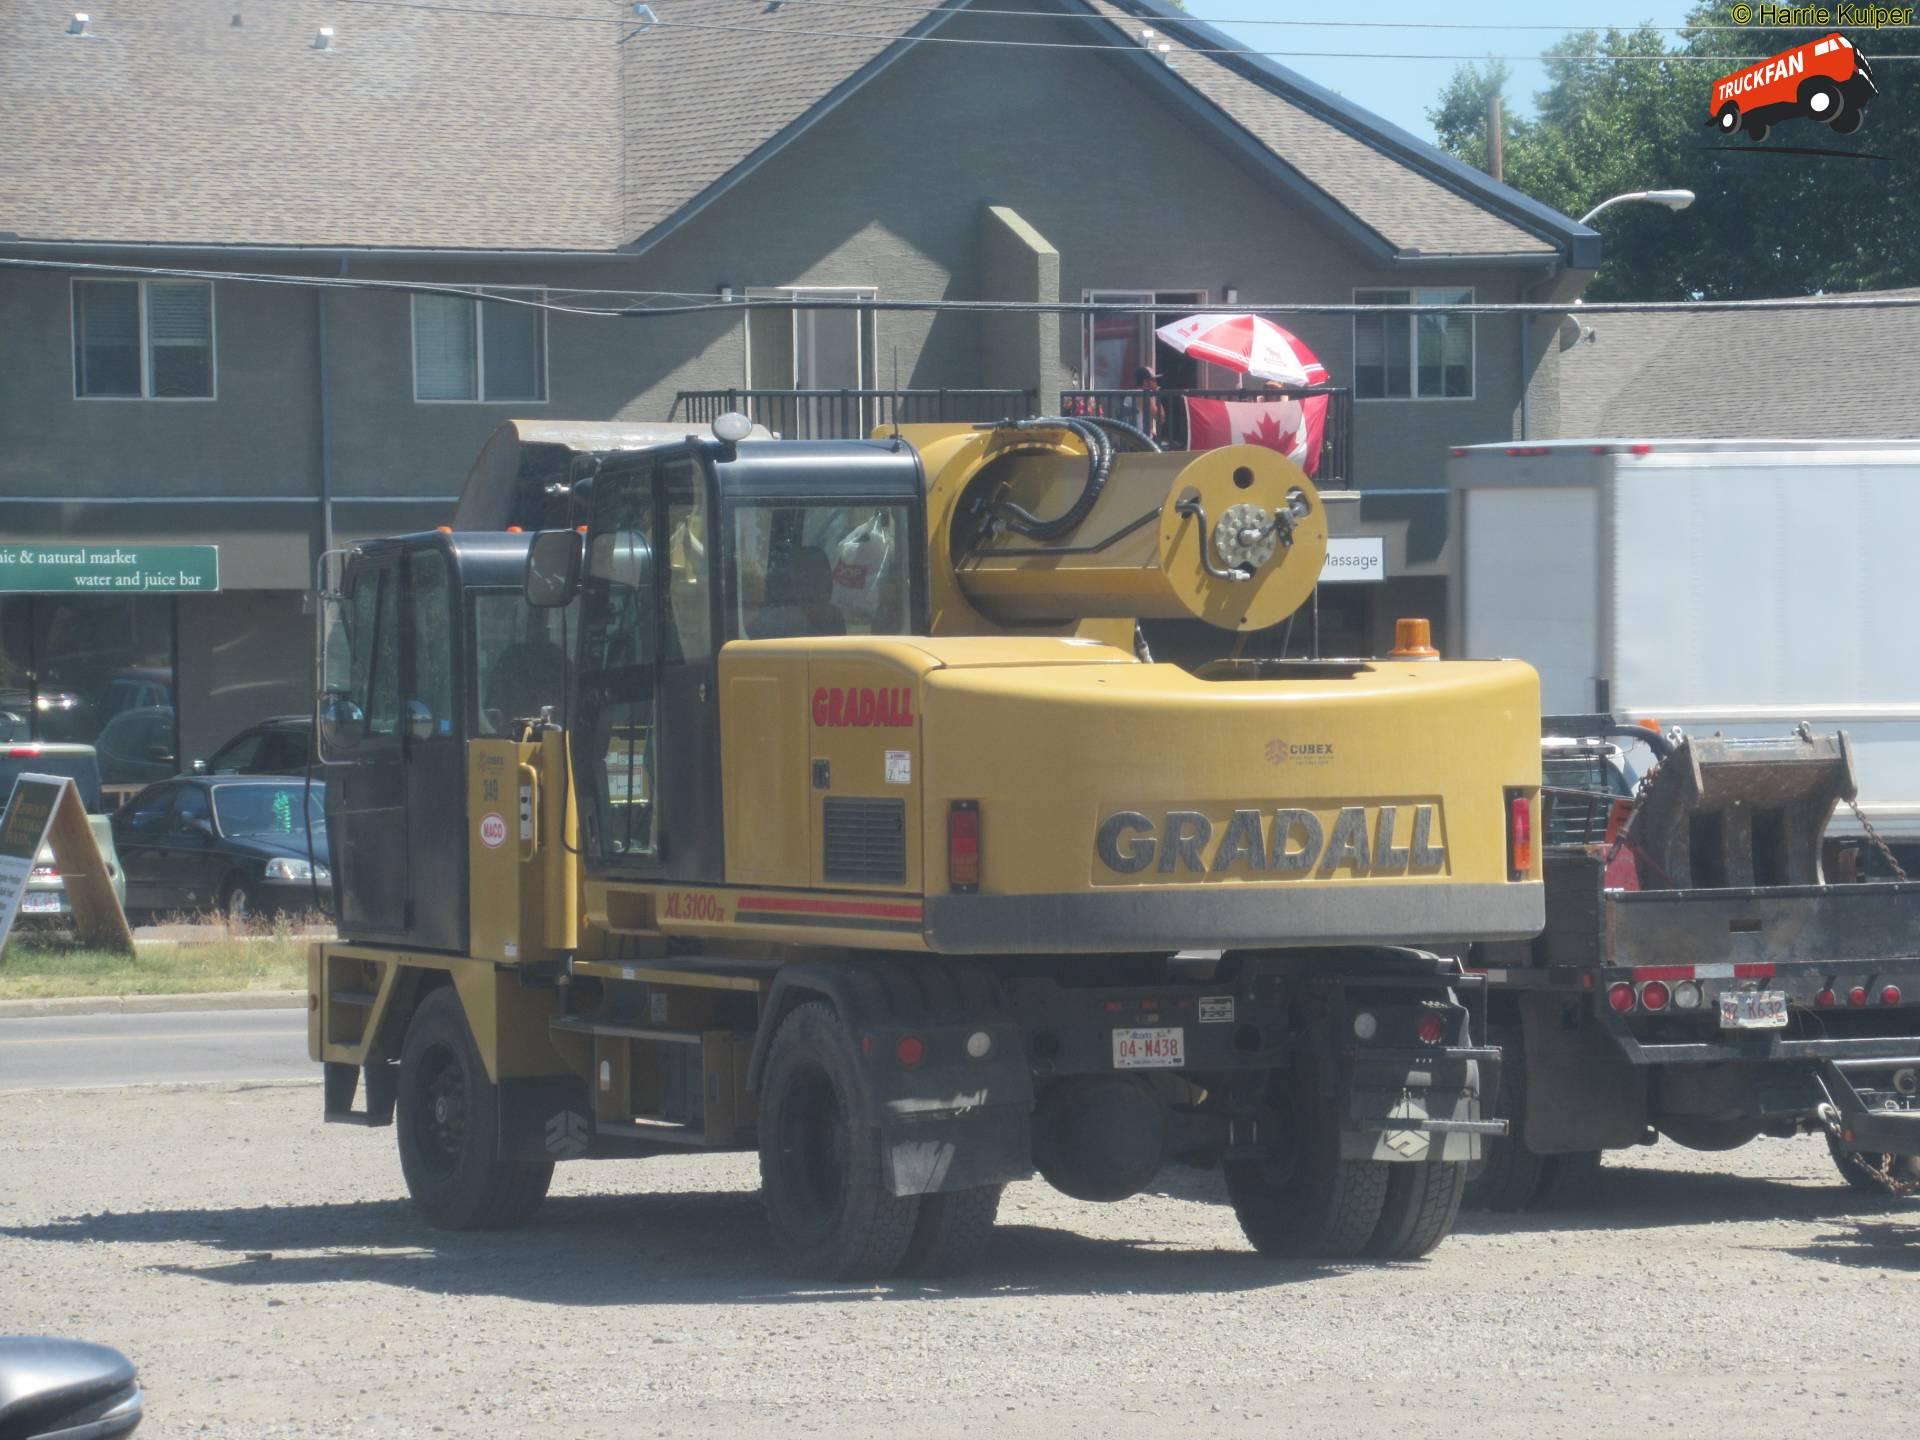 Gradall XL3100 IV